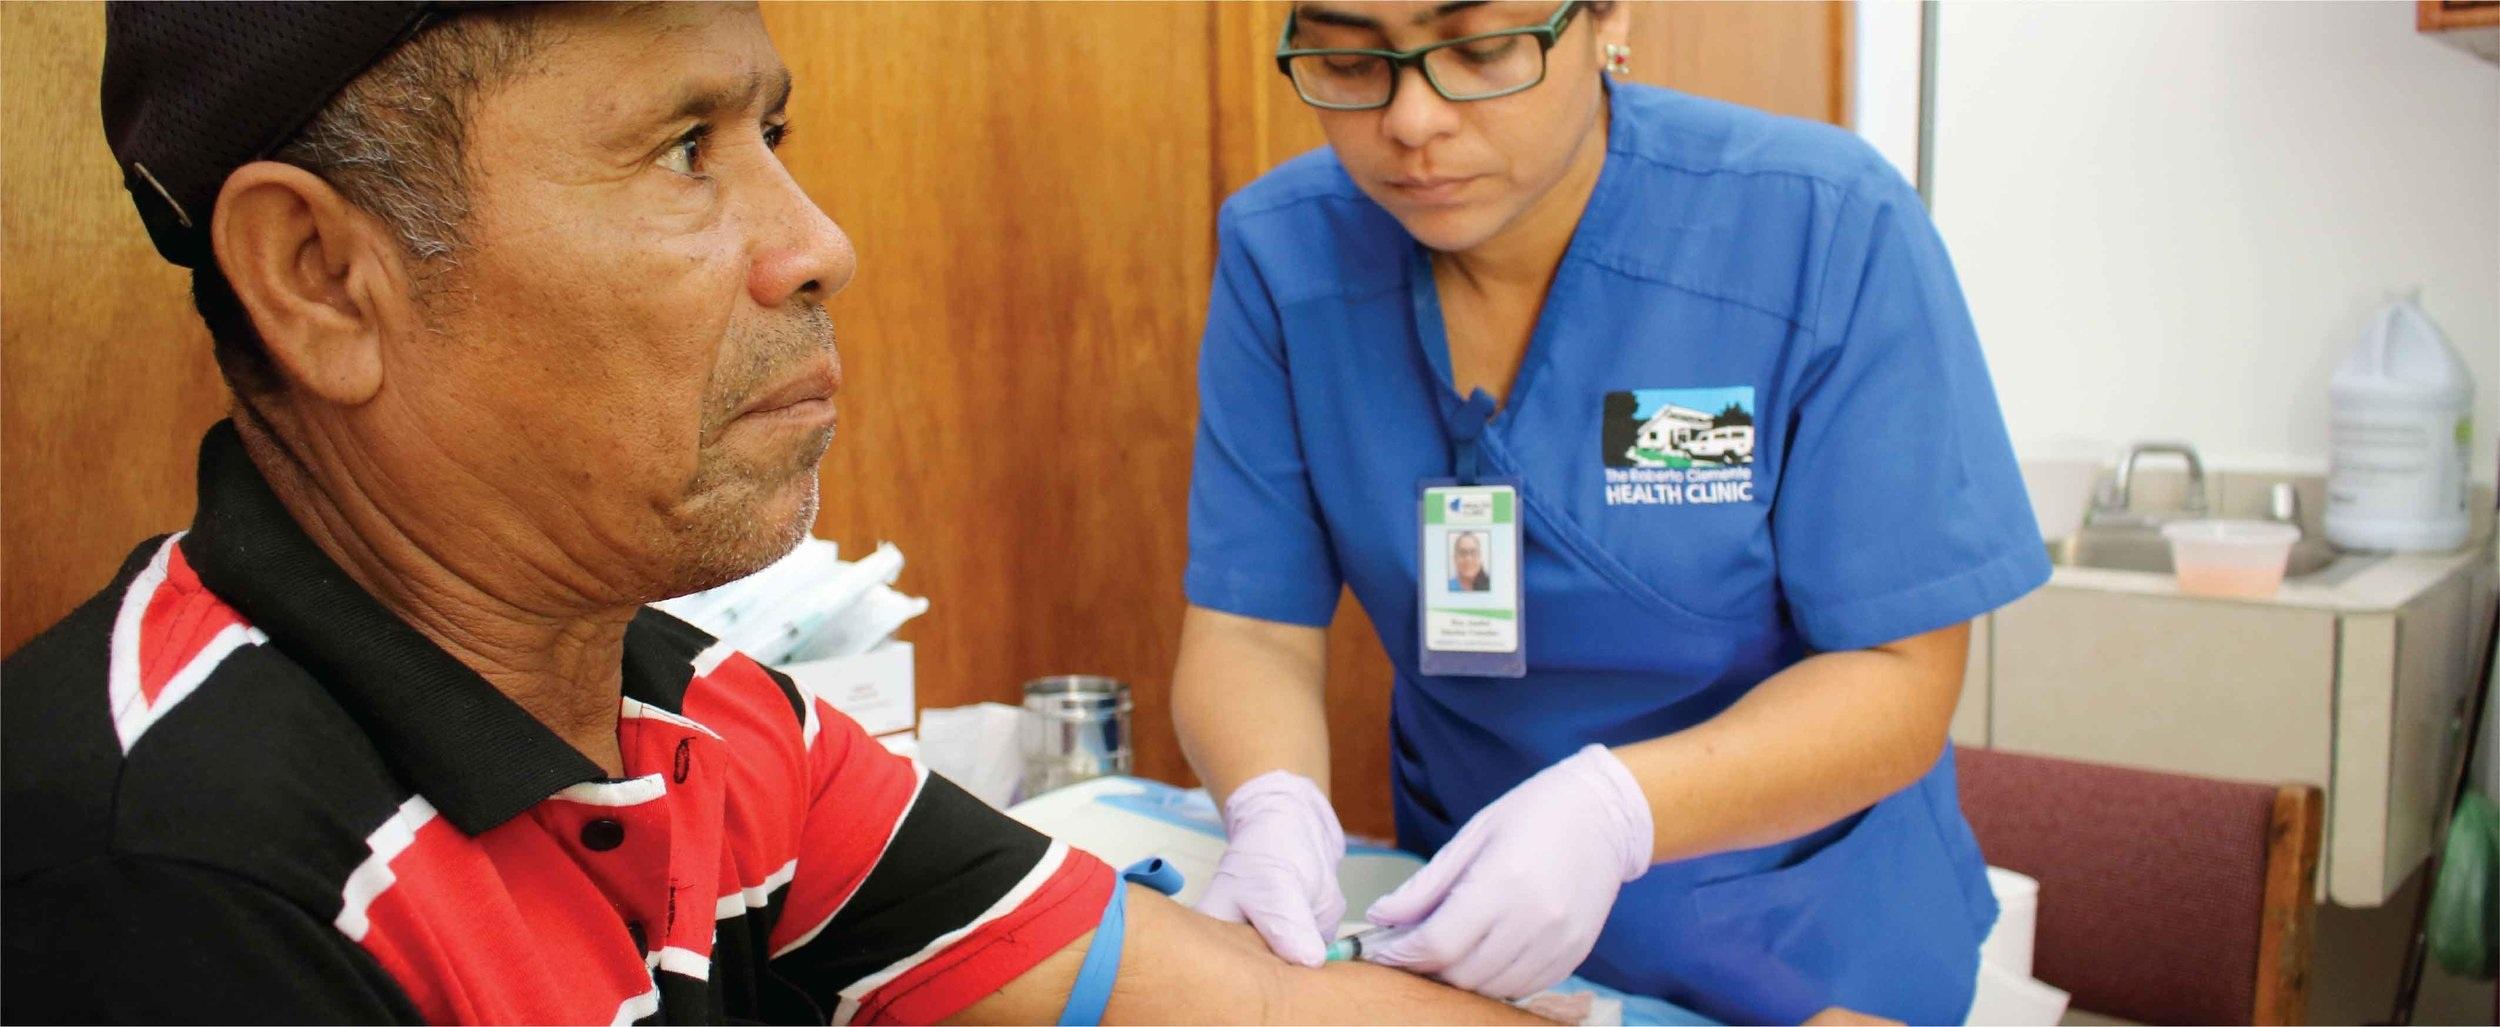 Health Center Distribution Network